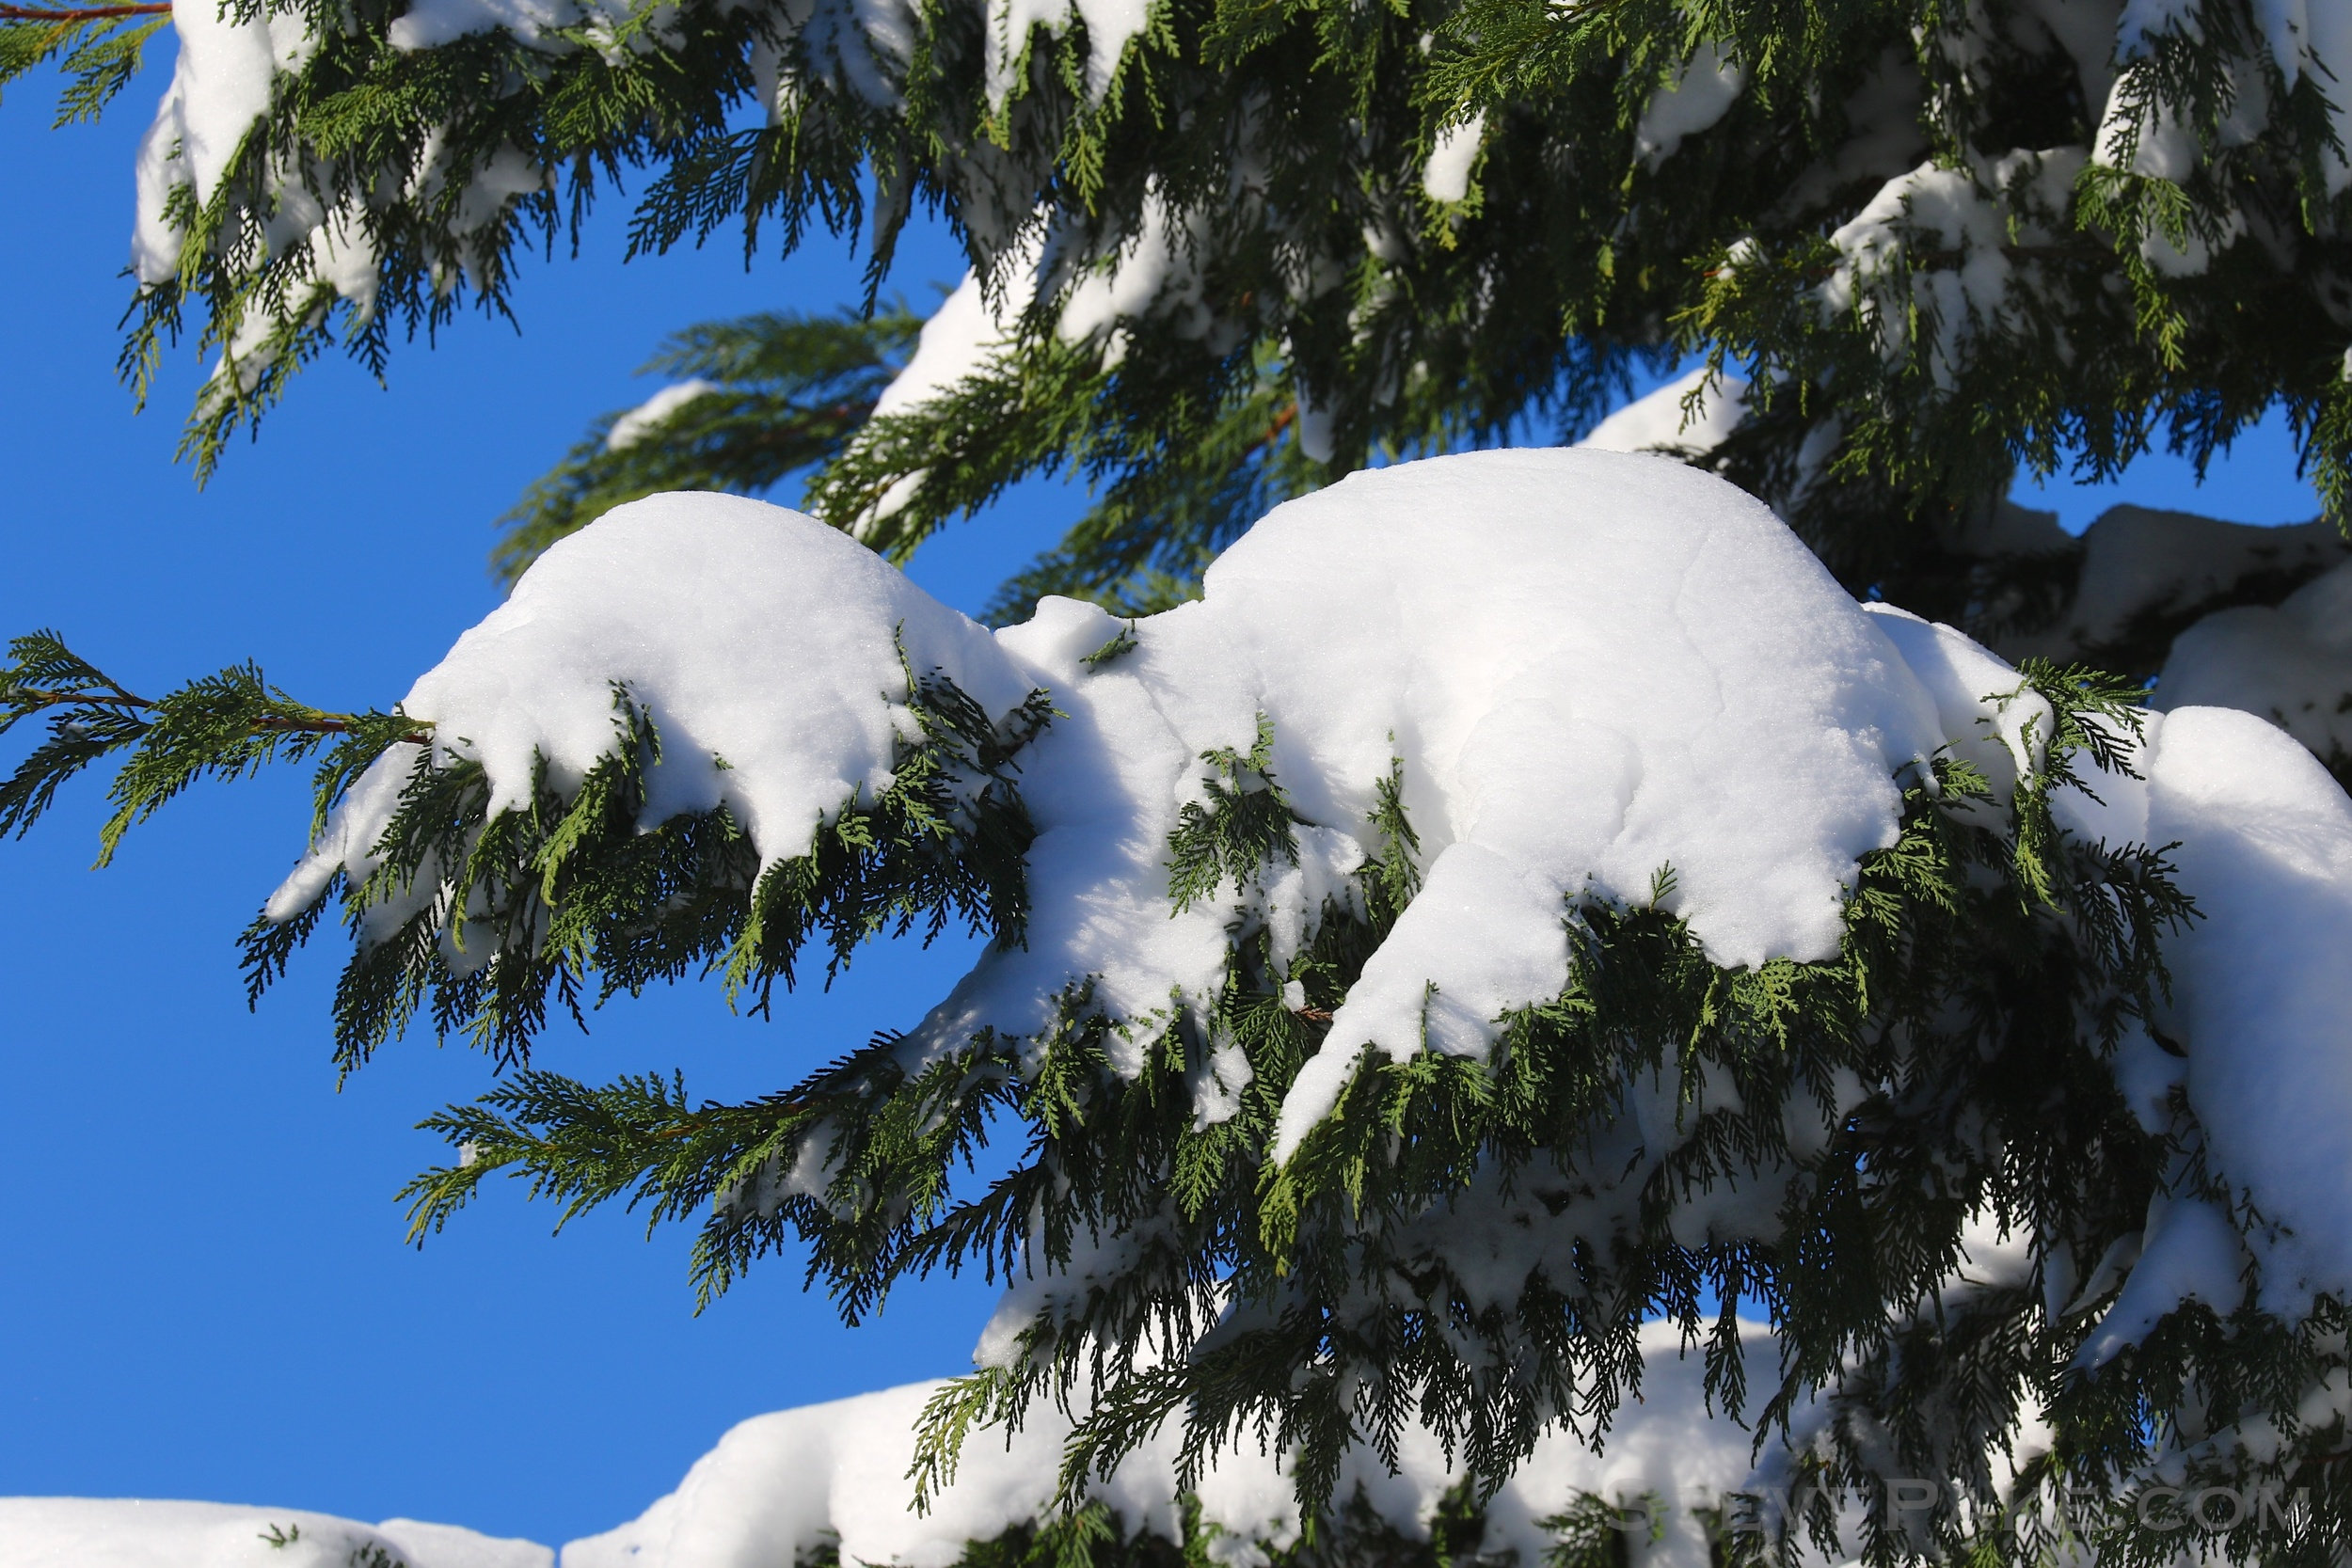 Snowzilla2016-047_GE3A5112.jpg